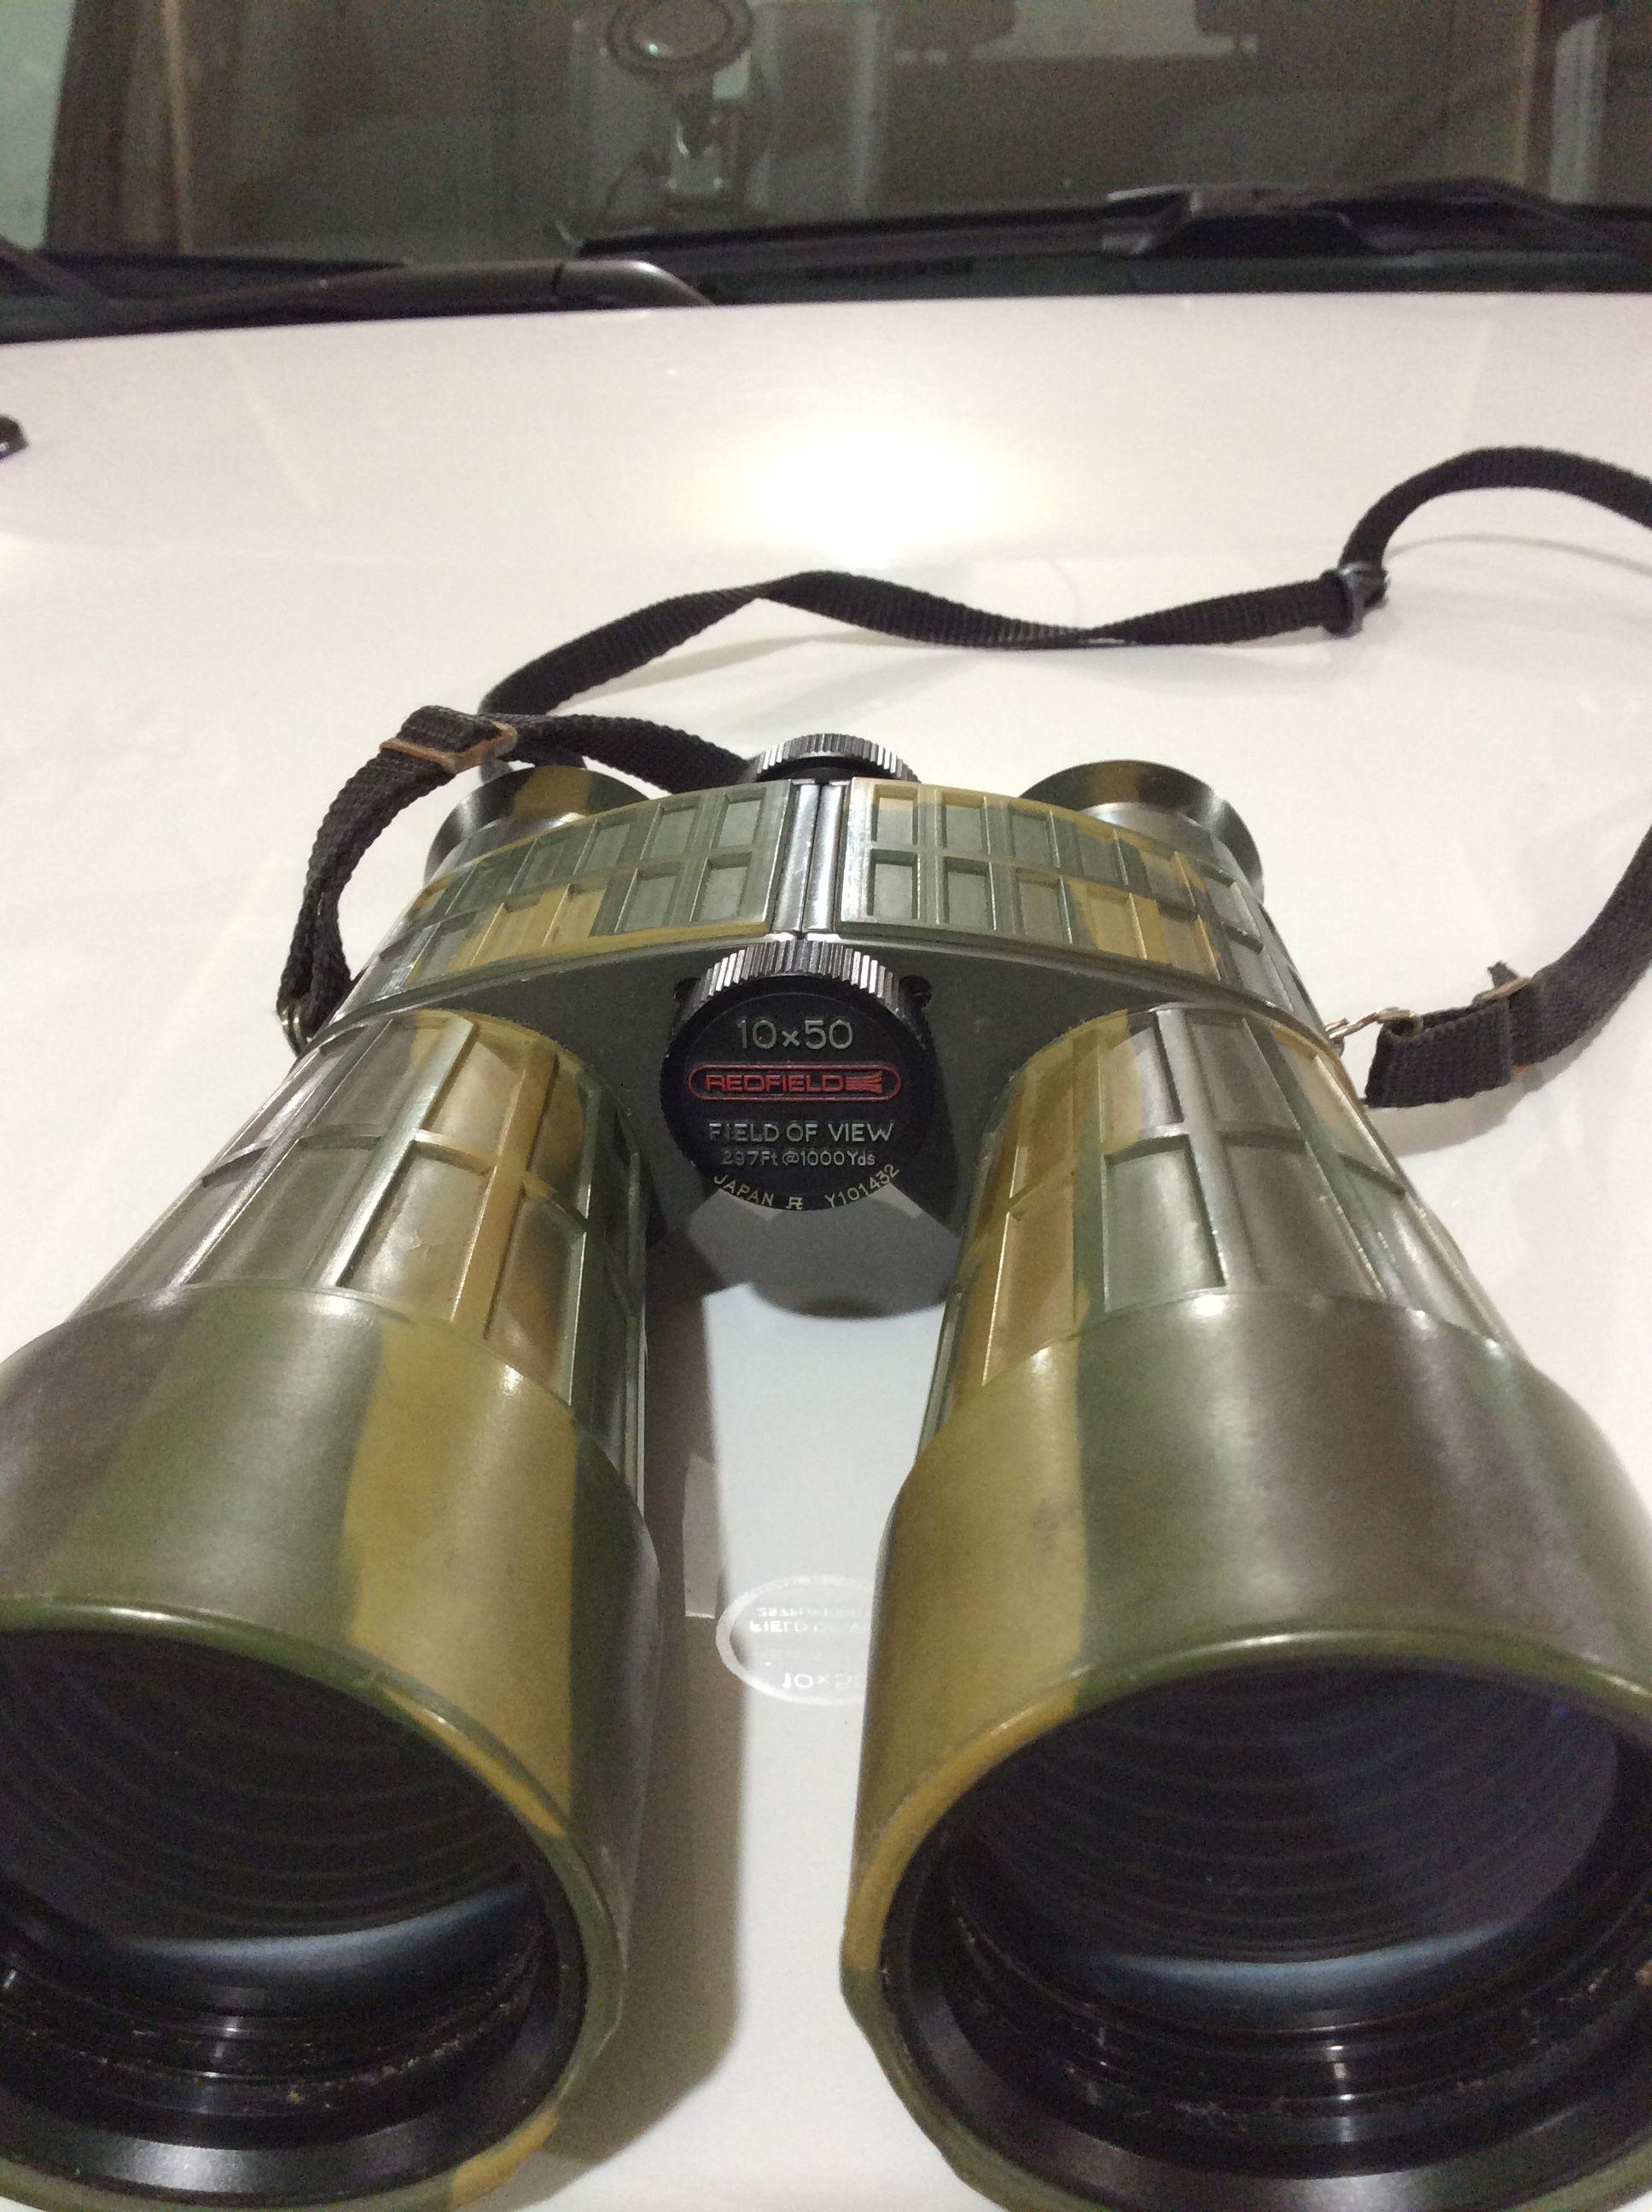 Redfield 10x50 Binoculars image 1